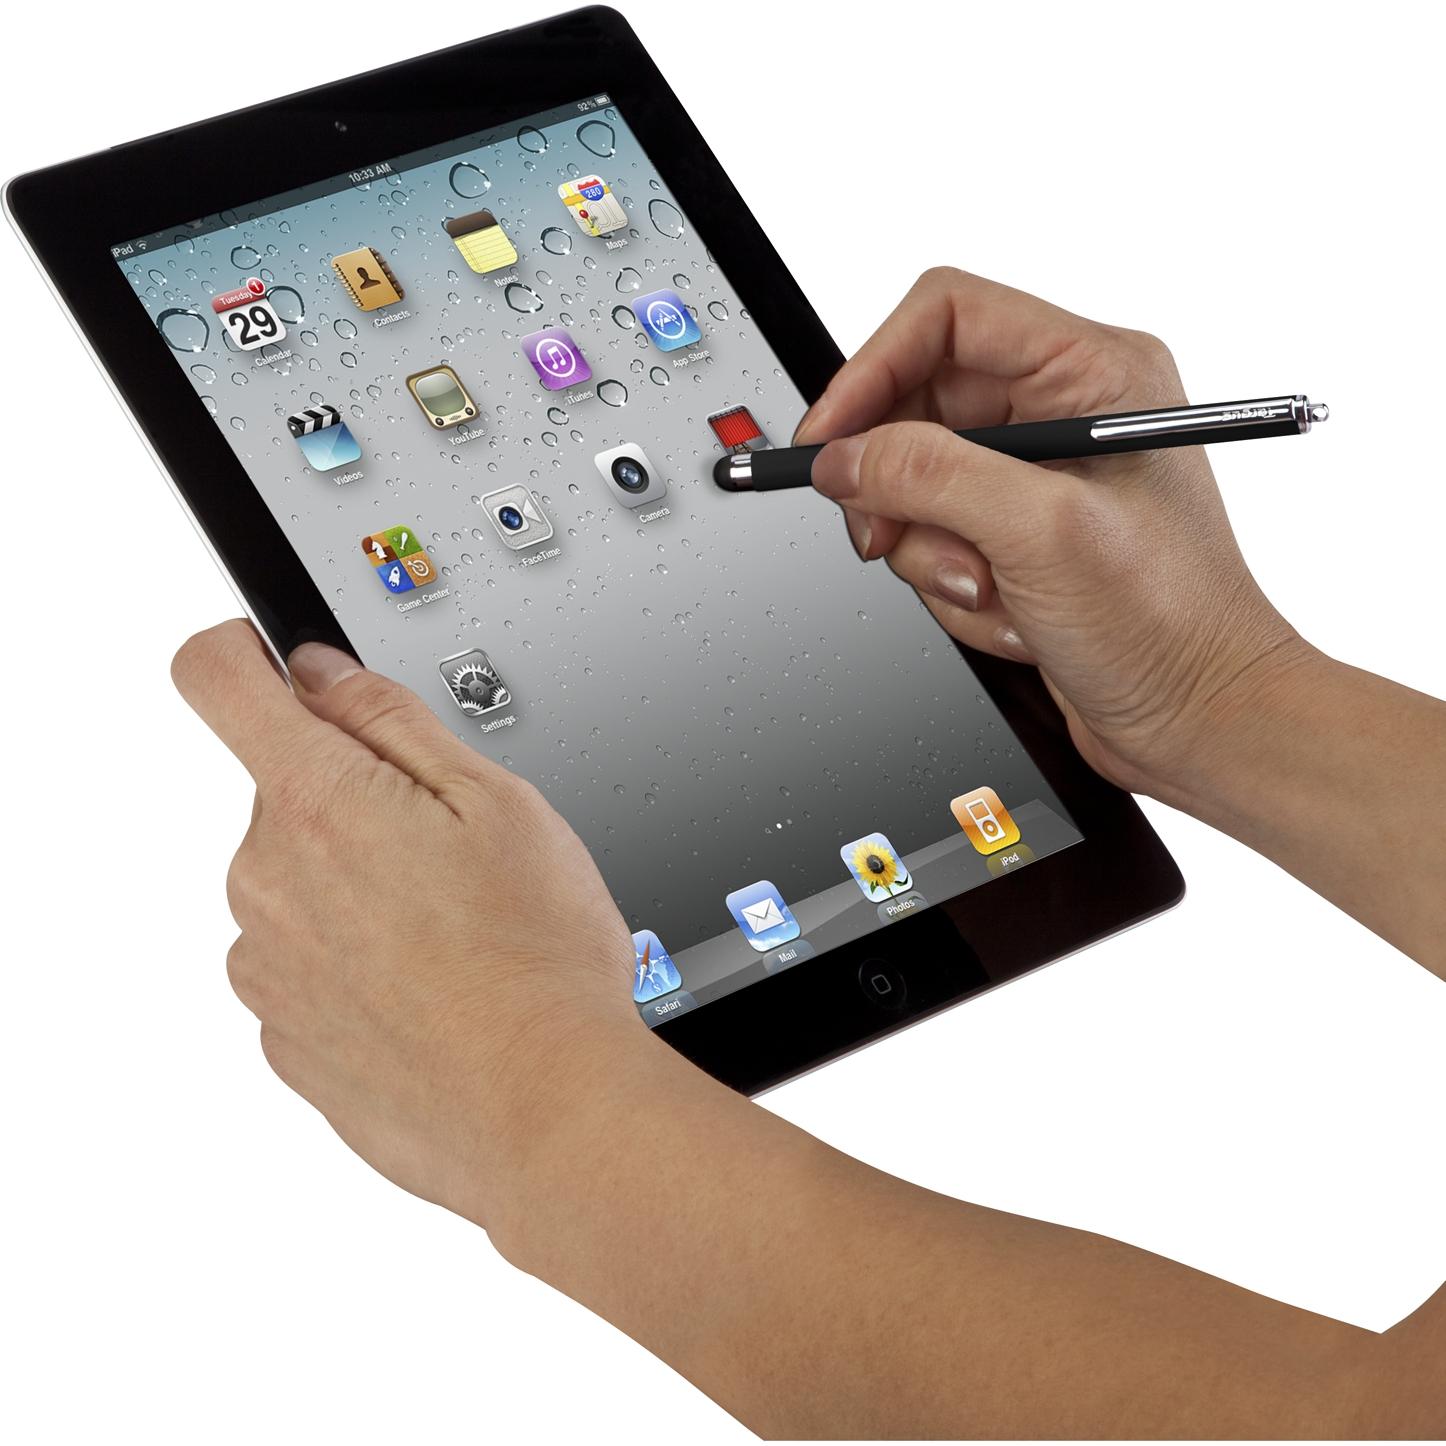 Handwriting Apps For iPad